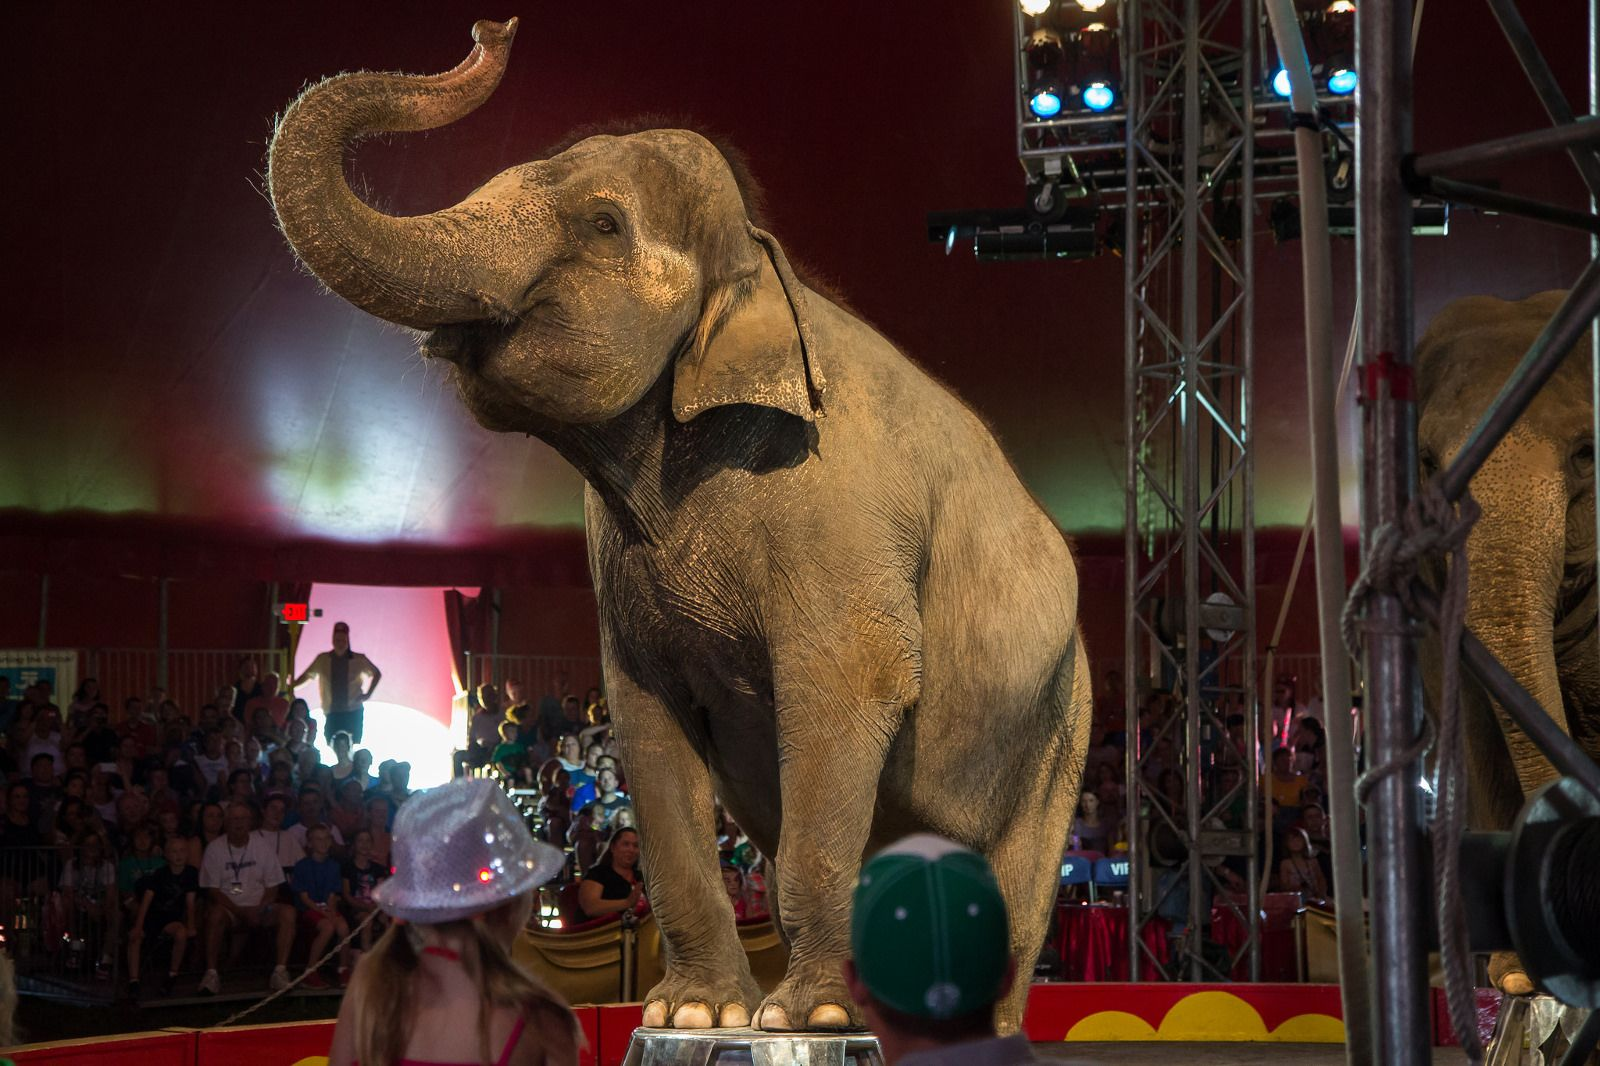 Circus Tricks And Tv Stunts How The International Zoo Association Defines Education Animals Wild Circus Elephant Elephant